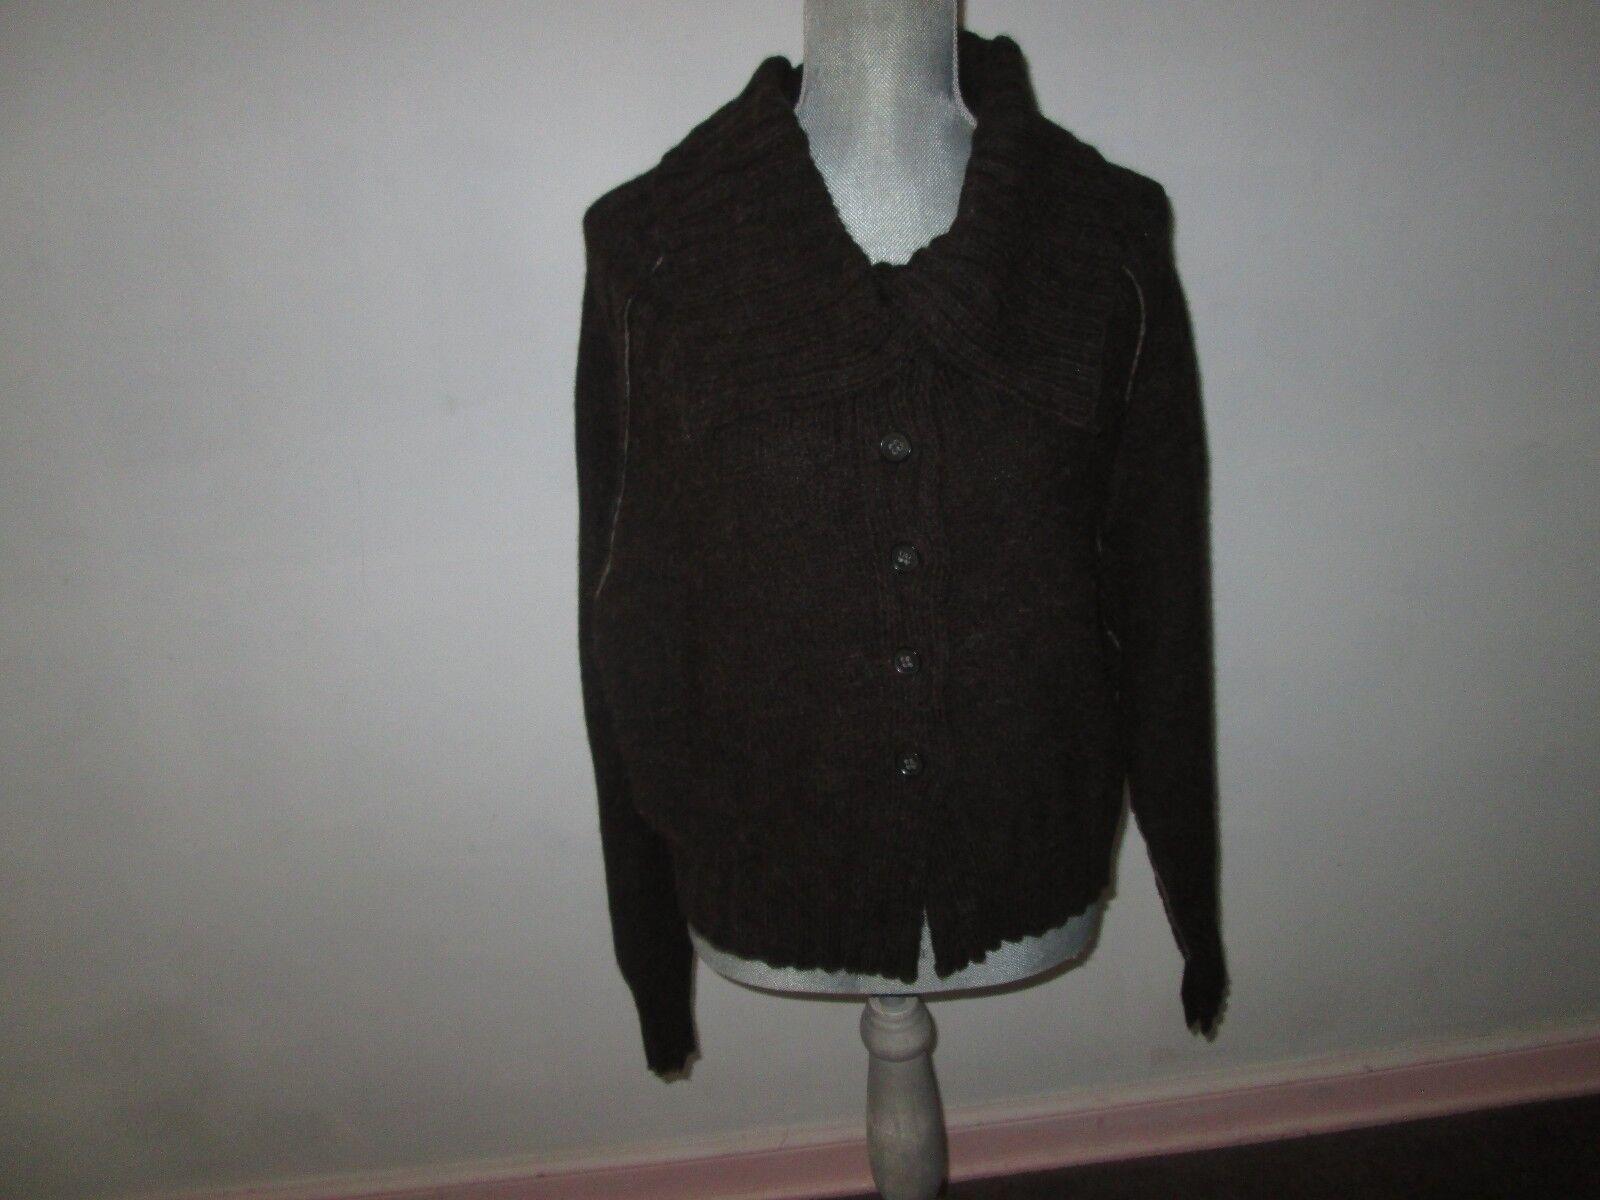 CREA CONCEPT Espresso Brown Wool Alpaca Blend Button Up Cardigan Sweater S